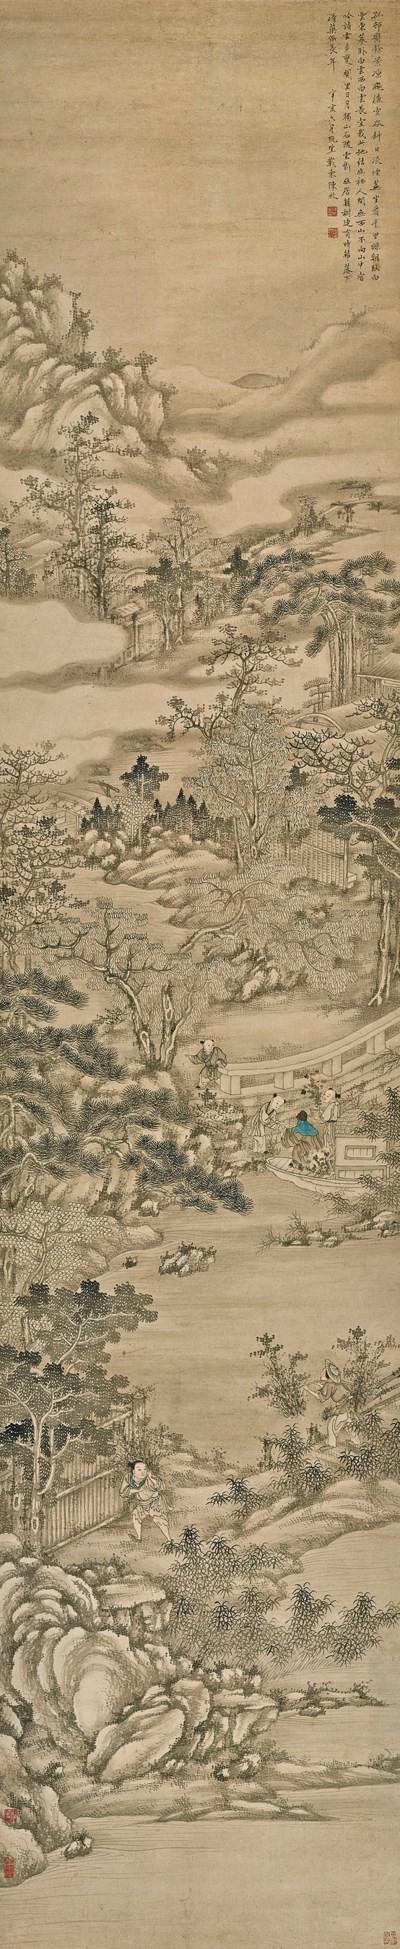 CHEN MEI (18TH CENTURY)